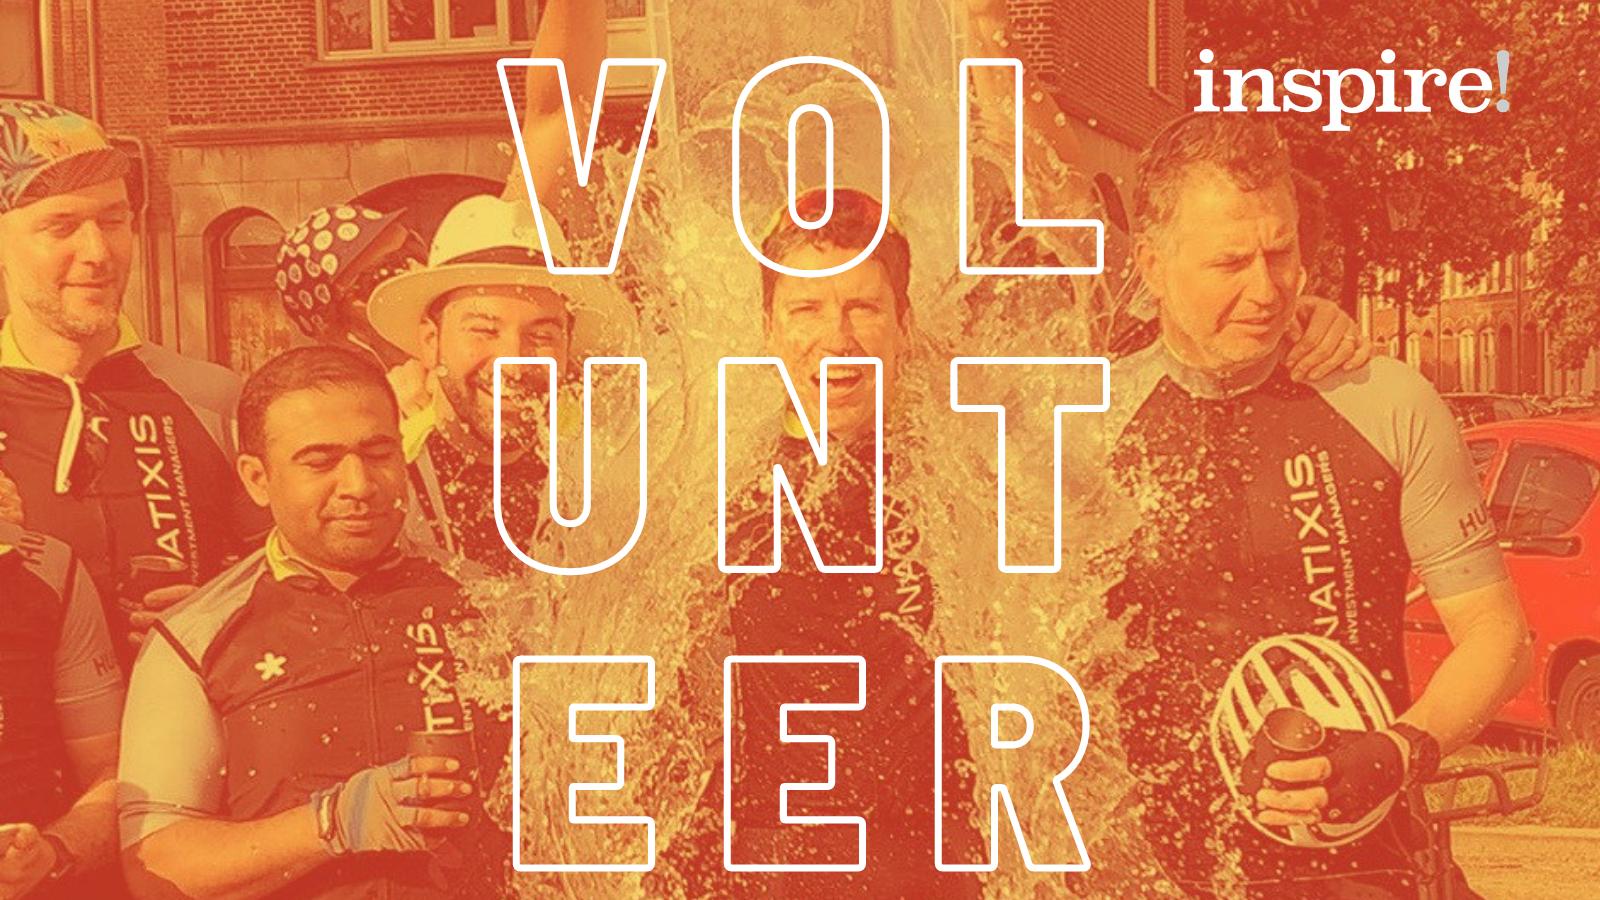 Volunteer fundraise